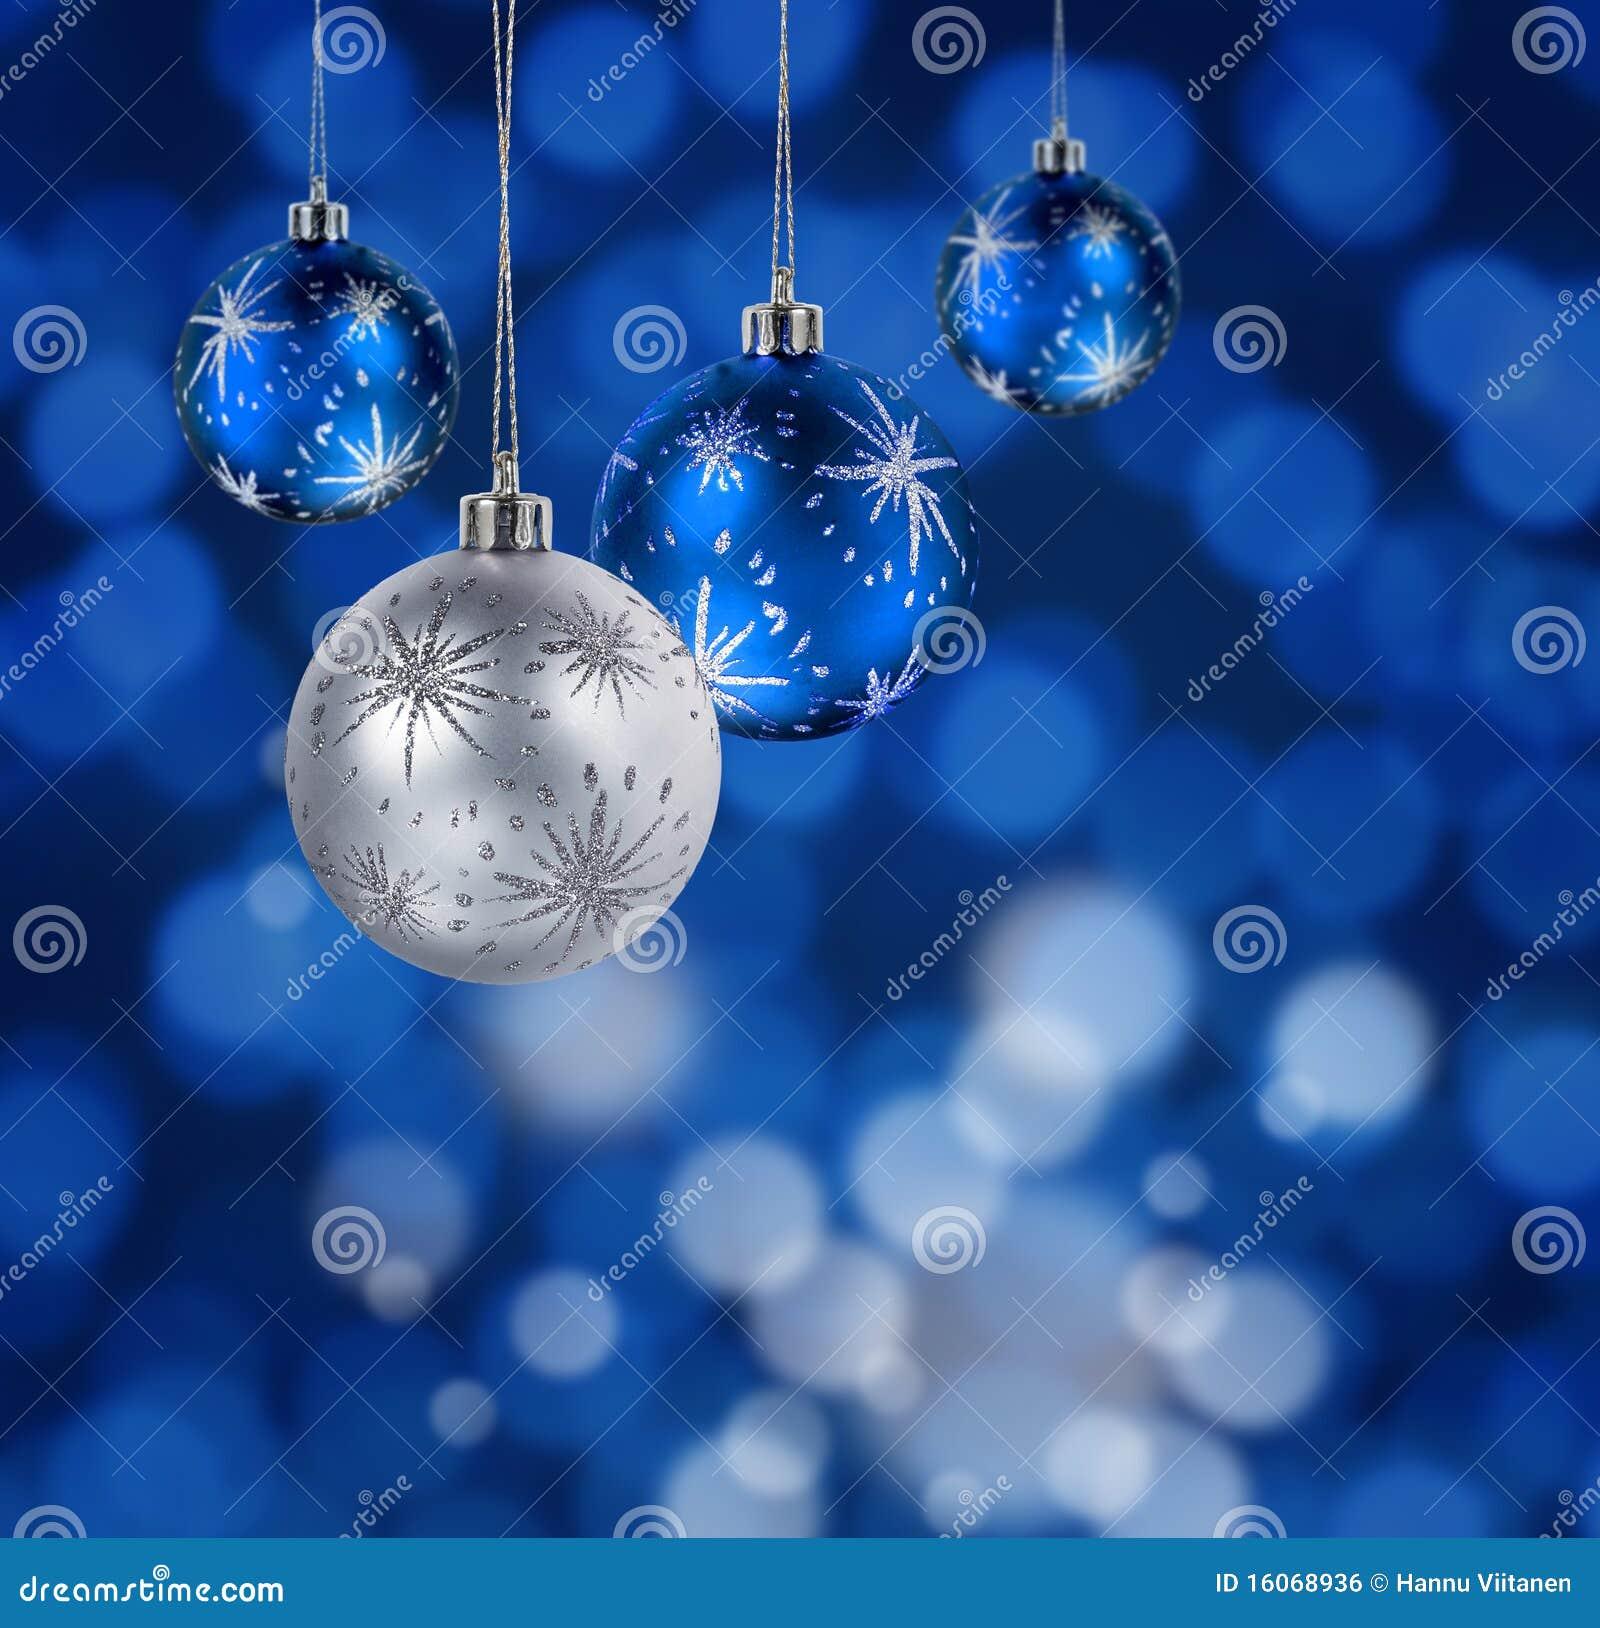 Blaue weihnachtskugeln lizenzfreies stockbild bild 16068936 for Weihnachtskugeln bilder